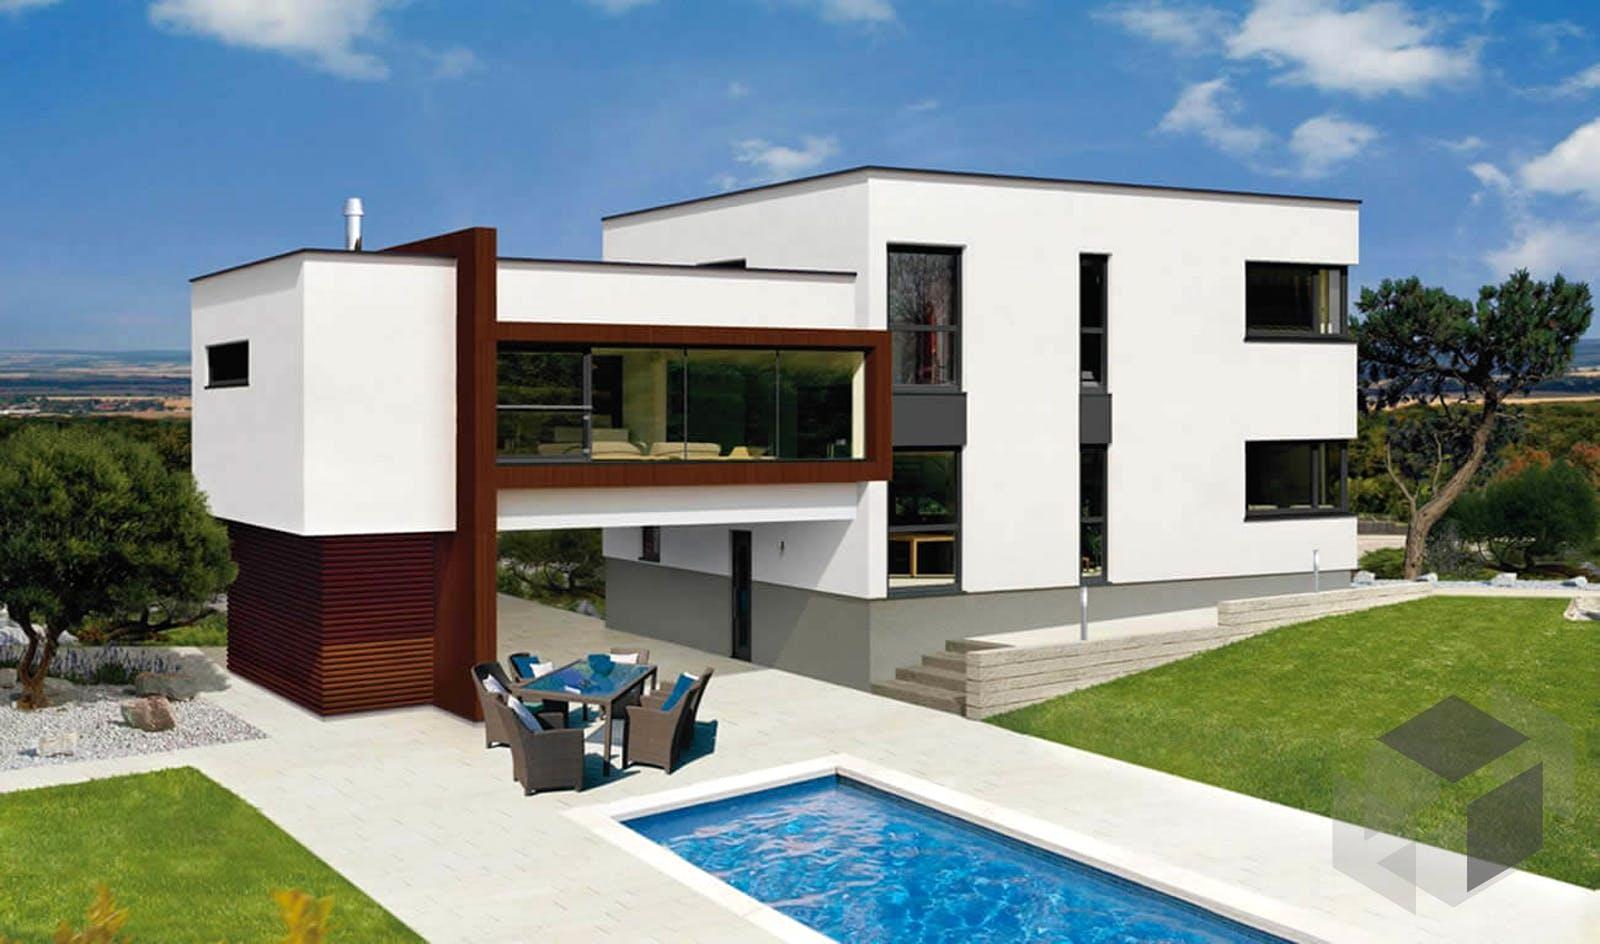 liberty 199 f von hartl haus komplette daten bersicht. Black Bedroom Furniture Sets. Home Design Ideas